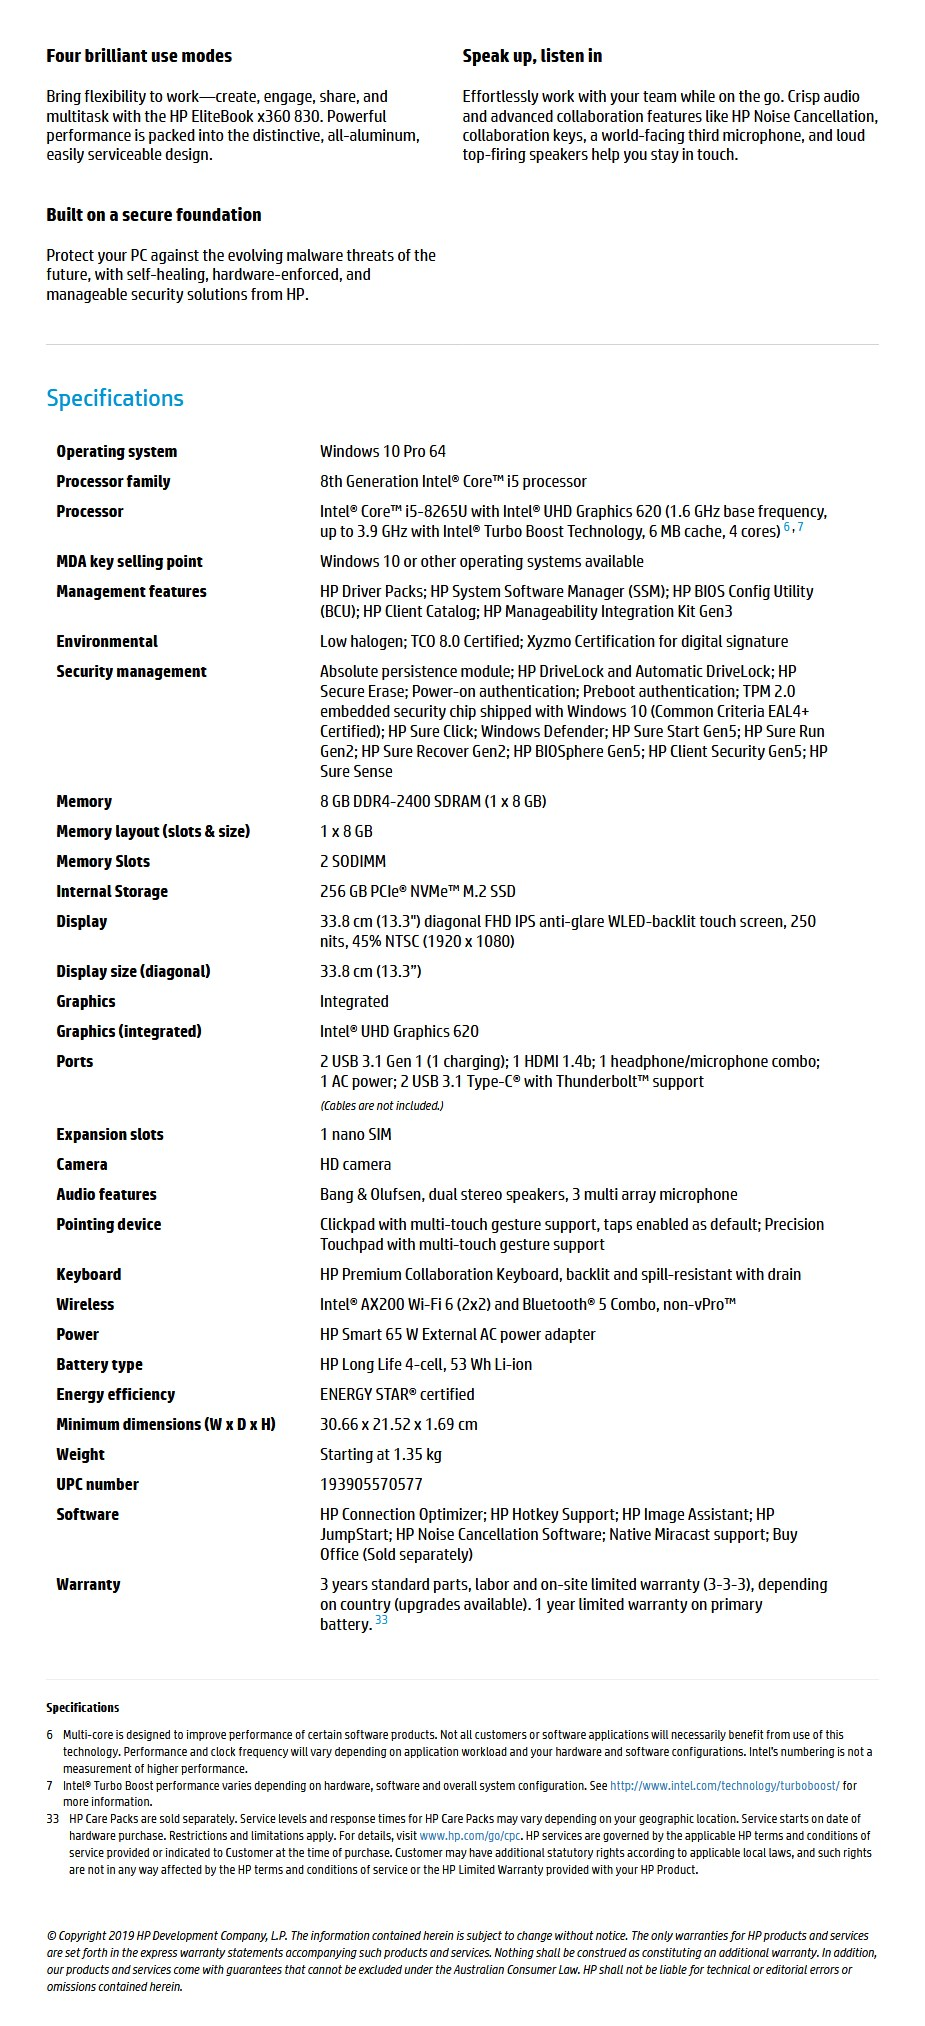 "HP EliteBook x360 830 G6 13.3"" Laptop i5-8265U 8GB 256GB W10P Touch - Overview 1"